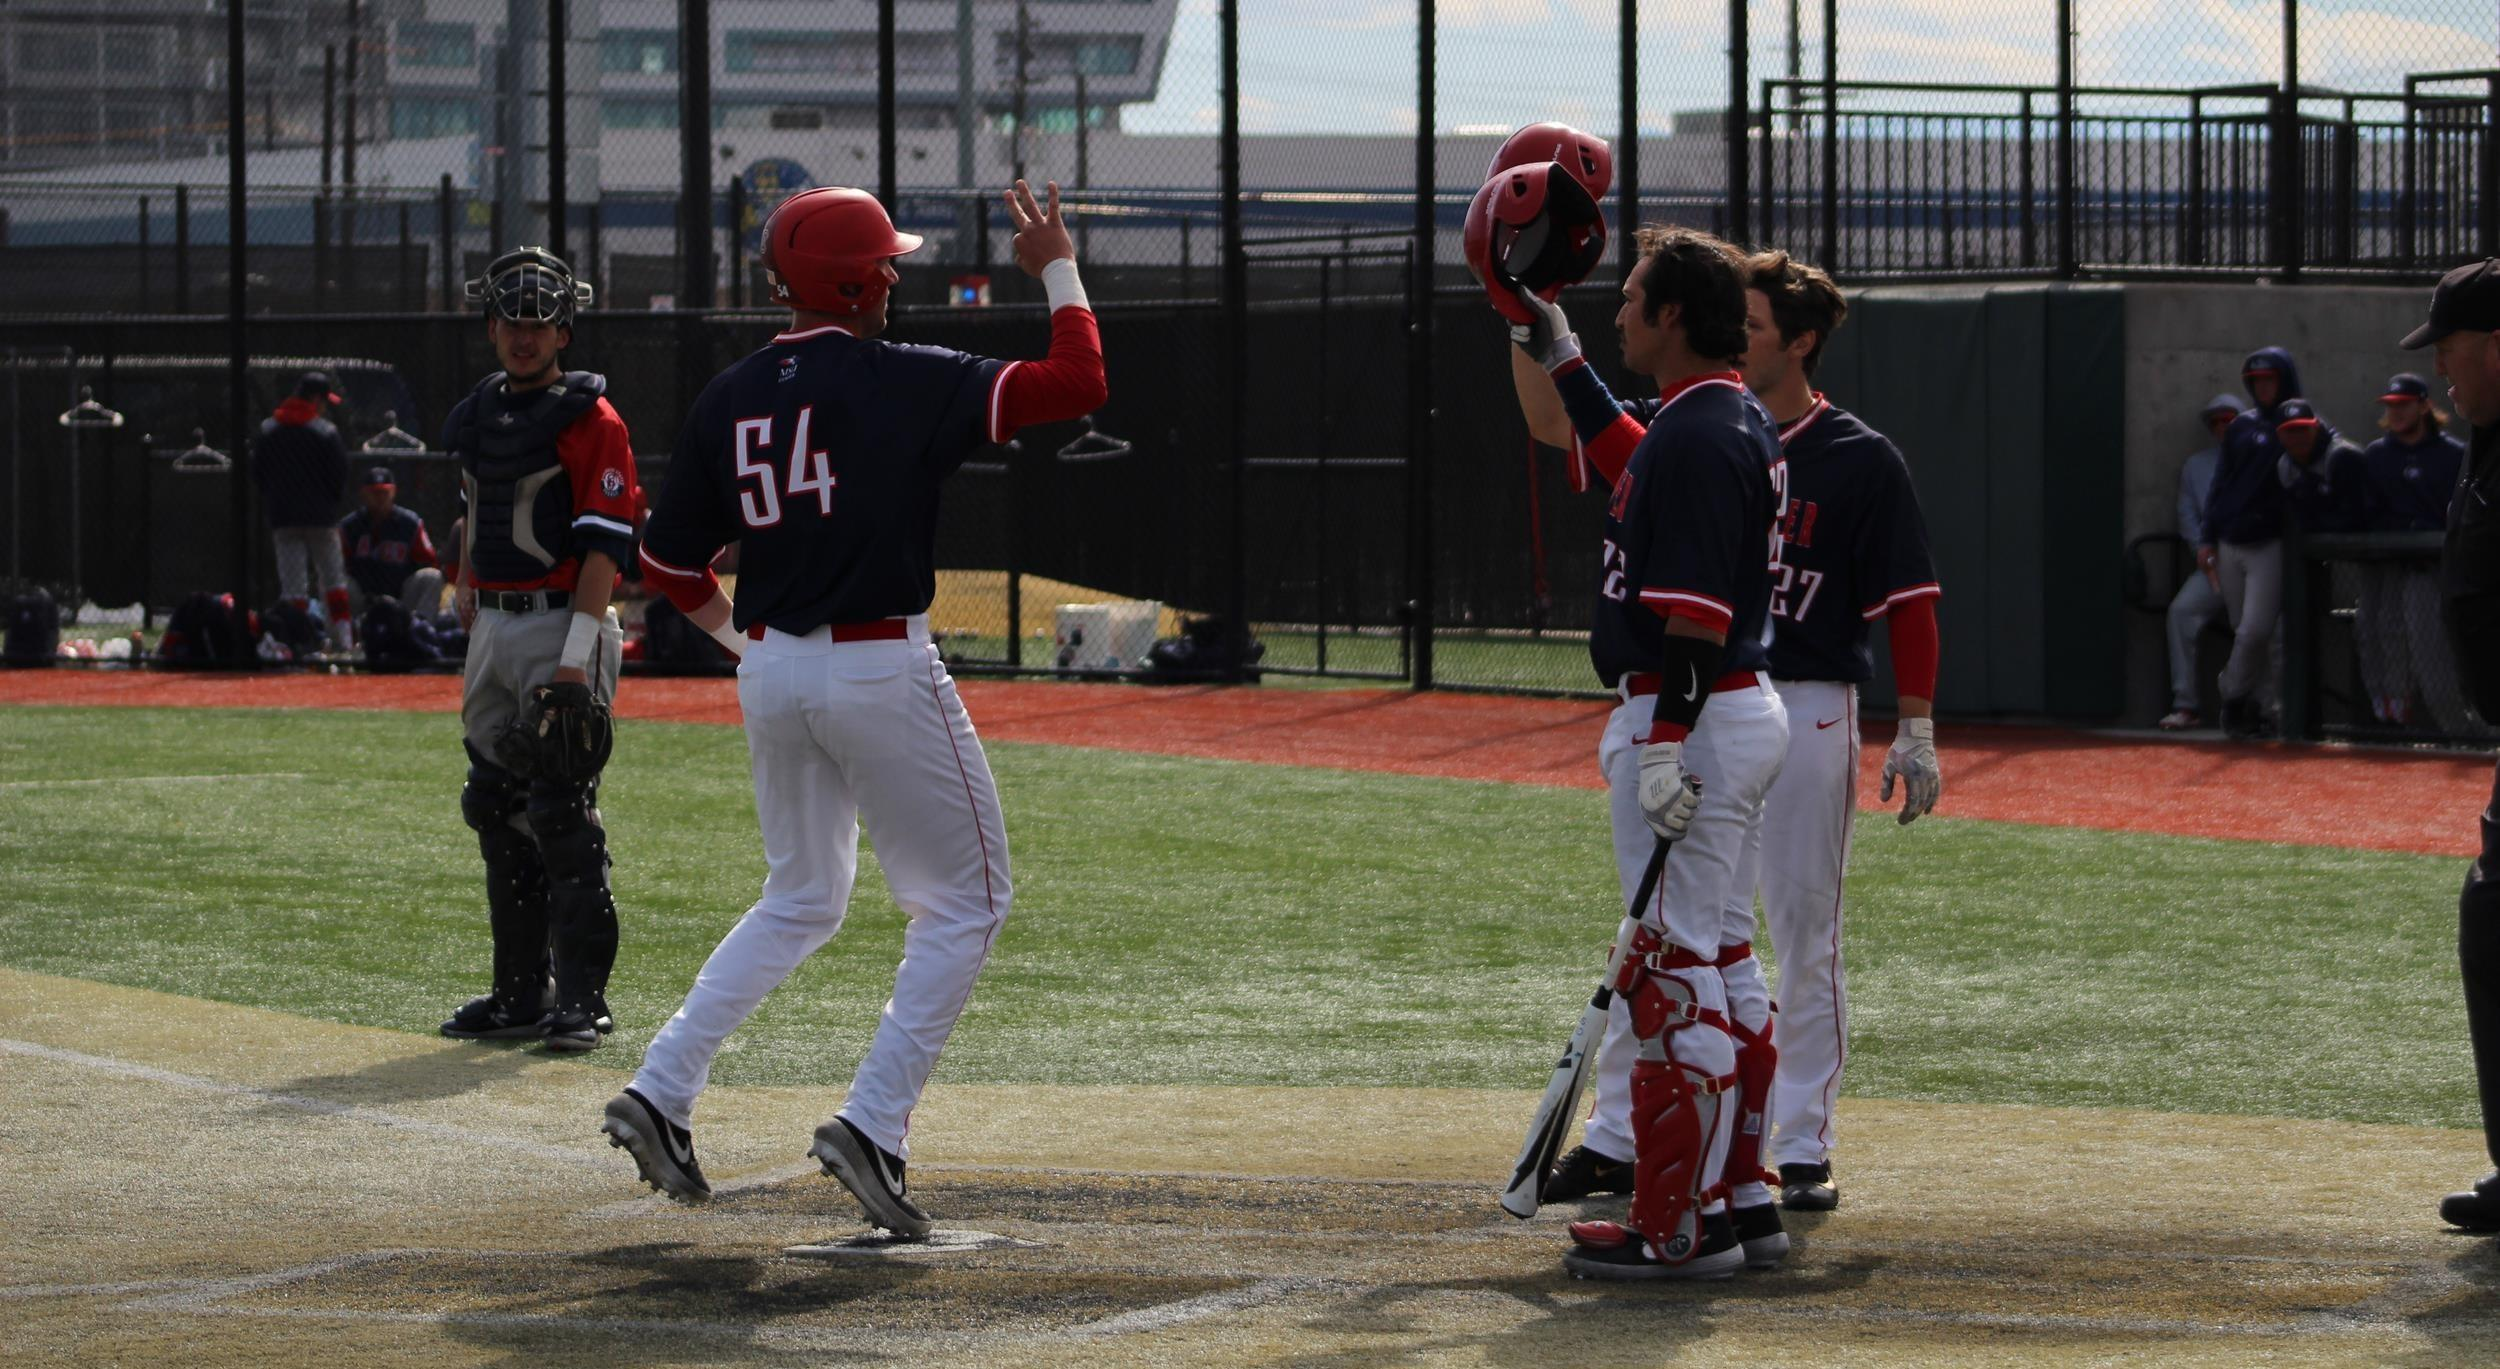 Matt Malkin of MSU Denver leads DII baseball in home runs.